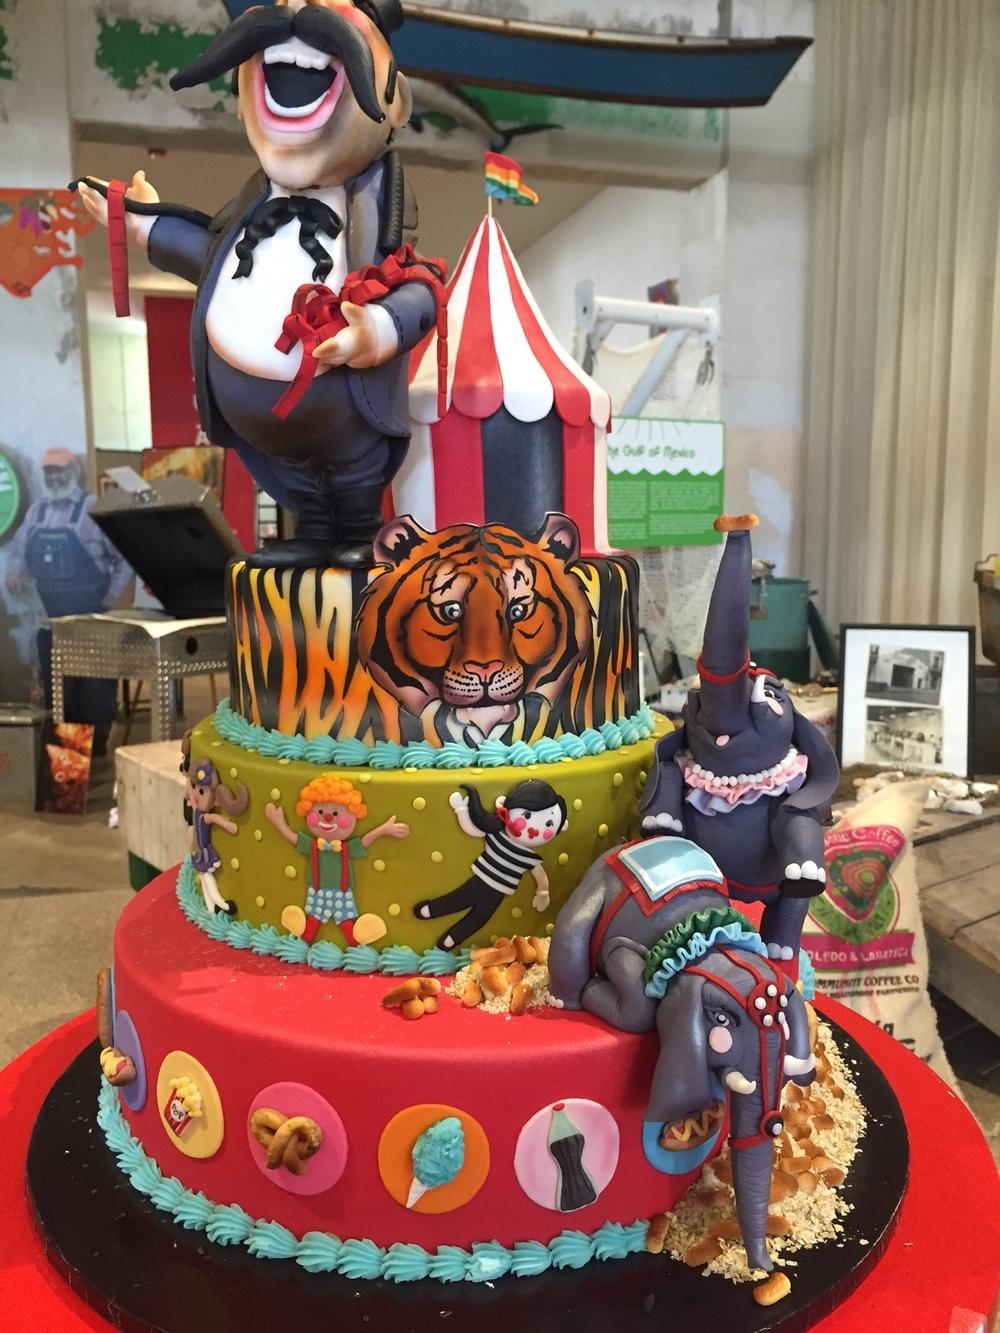 Melissa Daniel's winning Carnival Cake